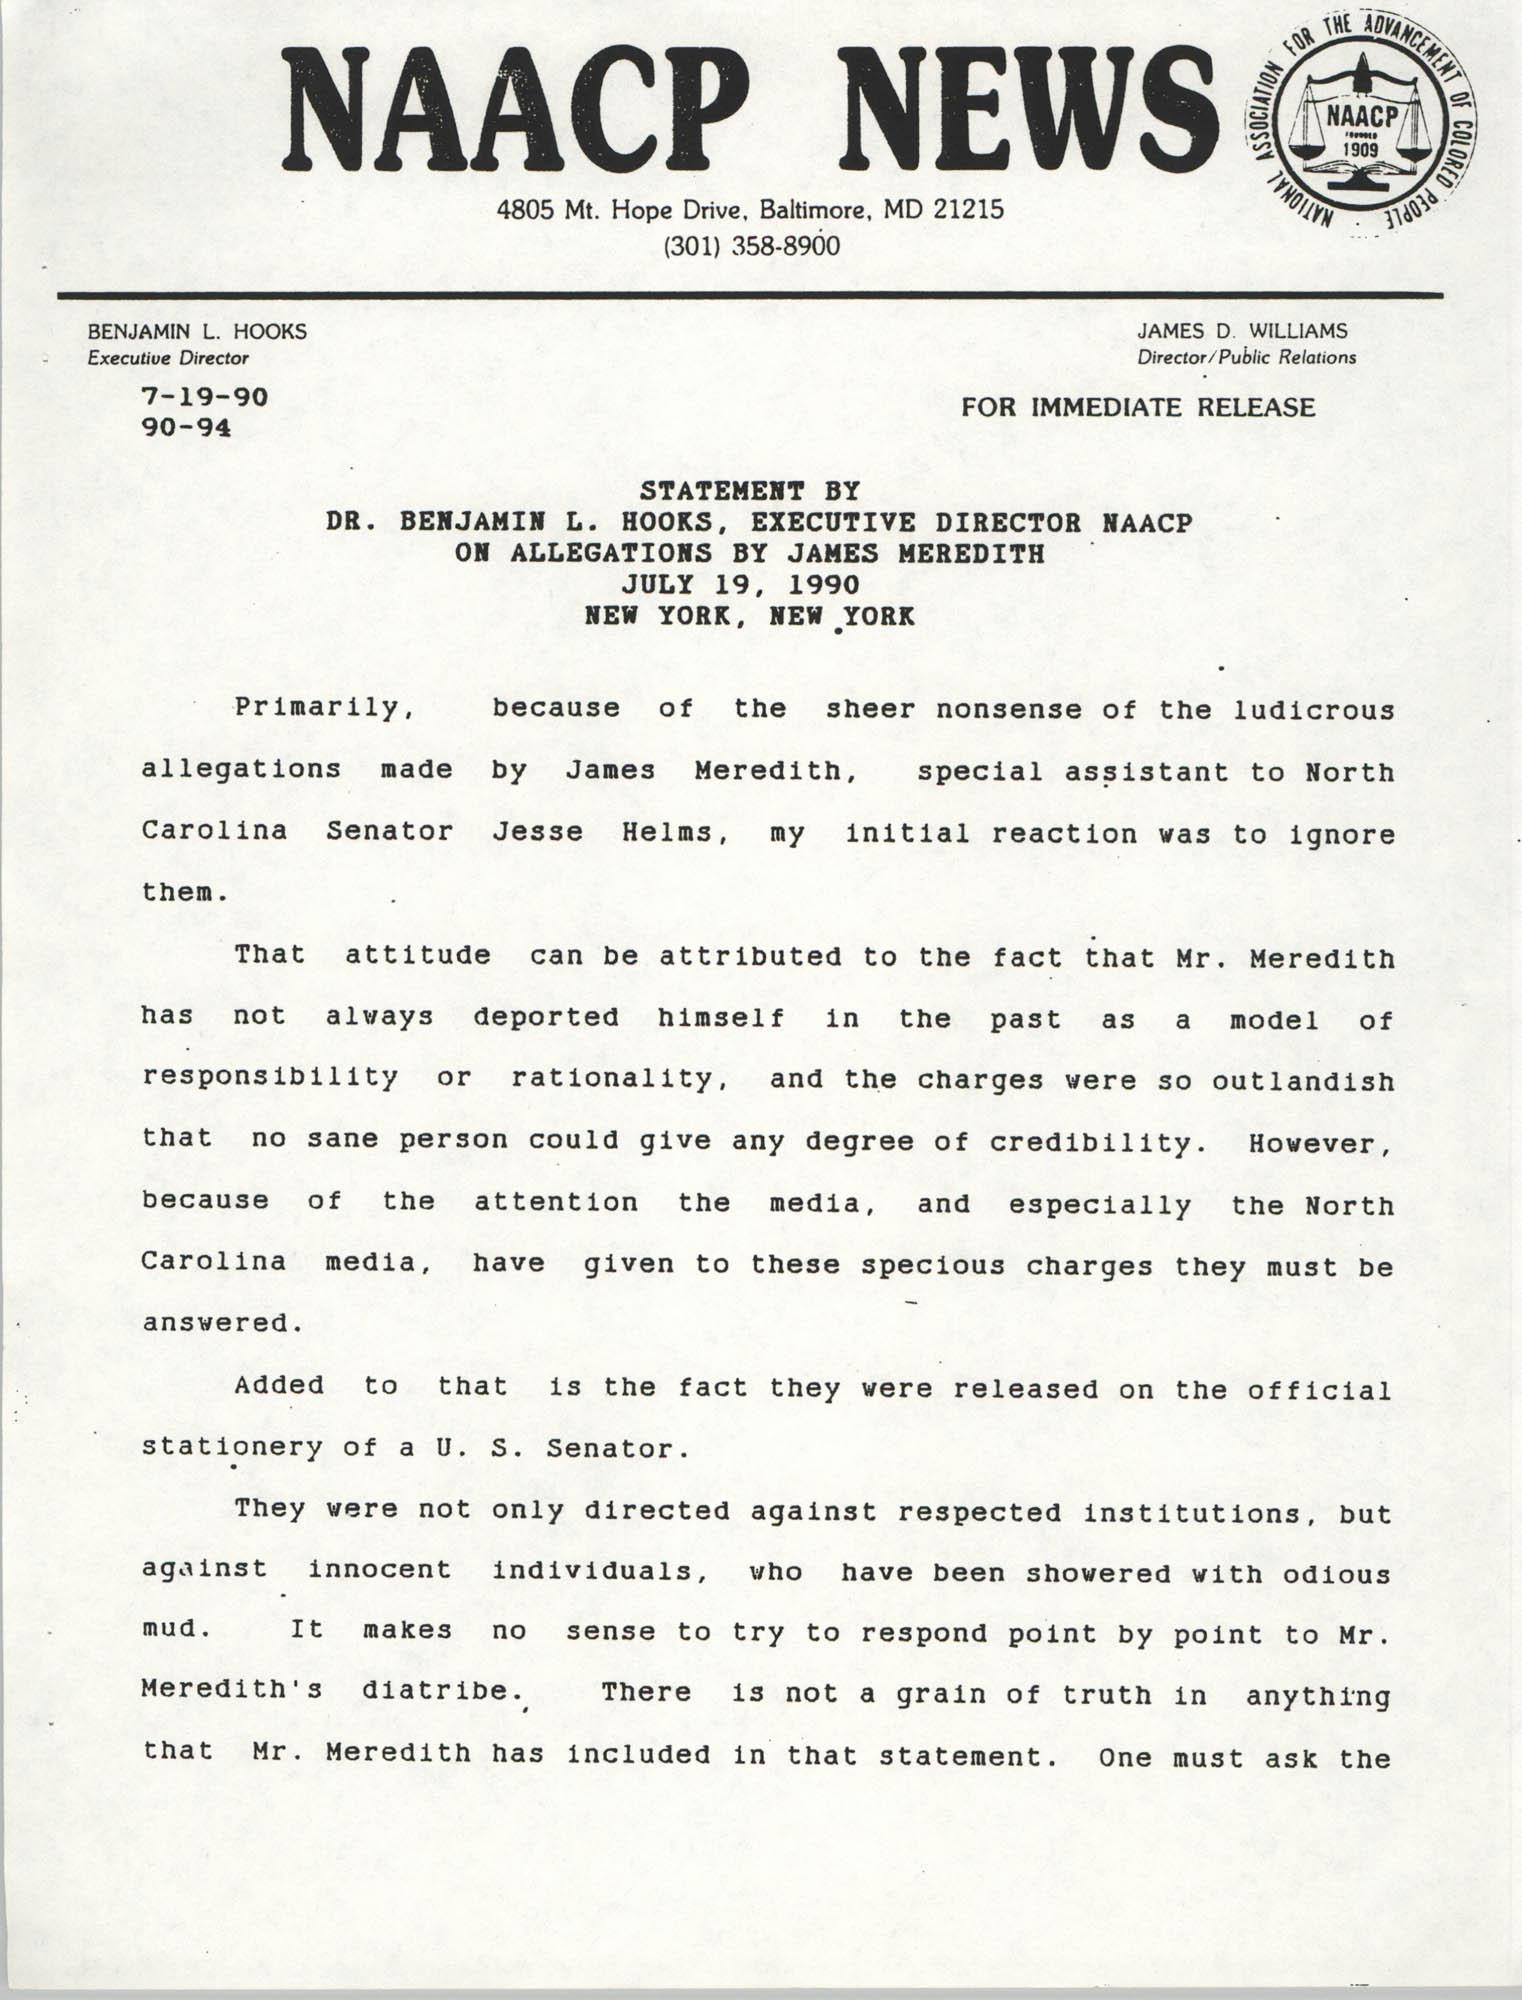 NAACP News Statement, July 19, 1990